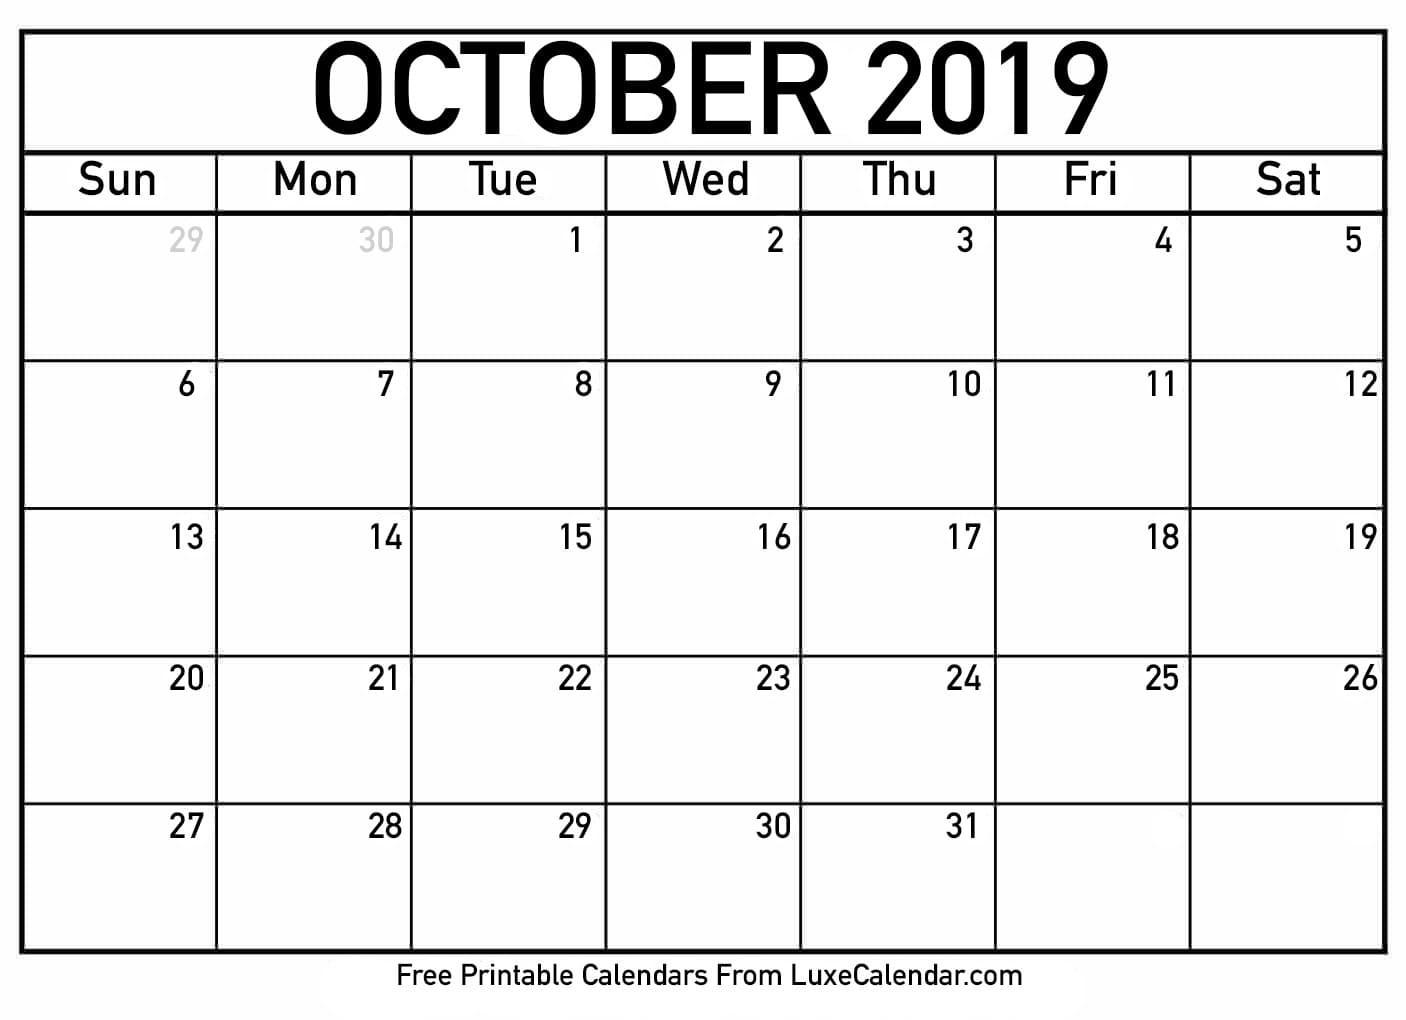 Free Printable Calendar Numbers For December | Ten Free Printable Calendar 2020-2021-Large Numbers Calendar October